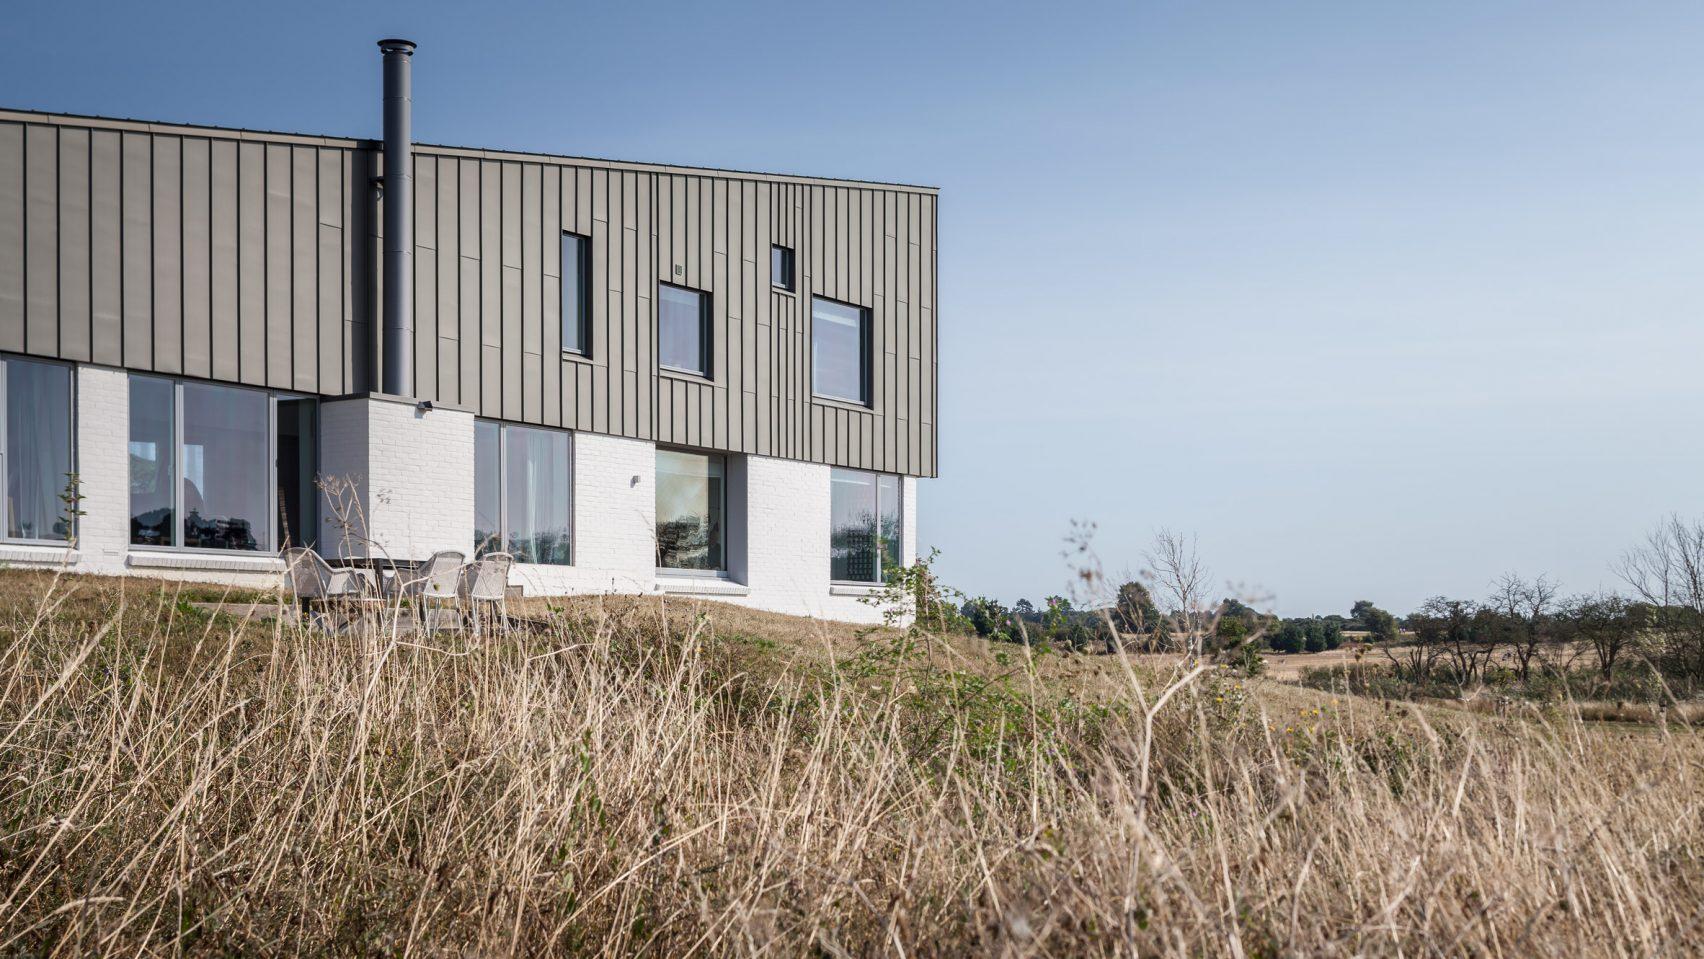 marsh-hill-mole-architecture-residential-uk-england_dezeen_hero-2-1704x959.jpg